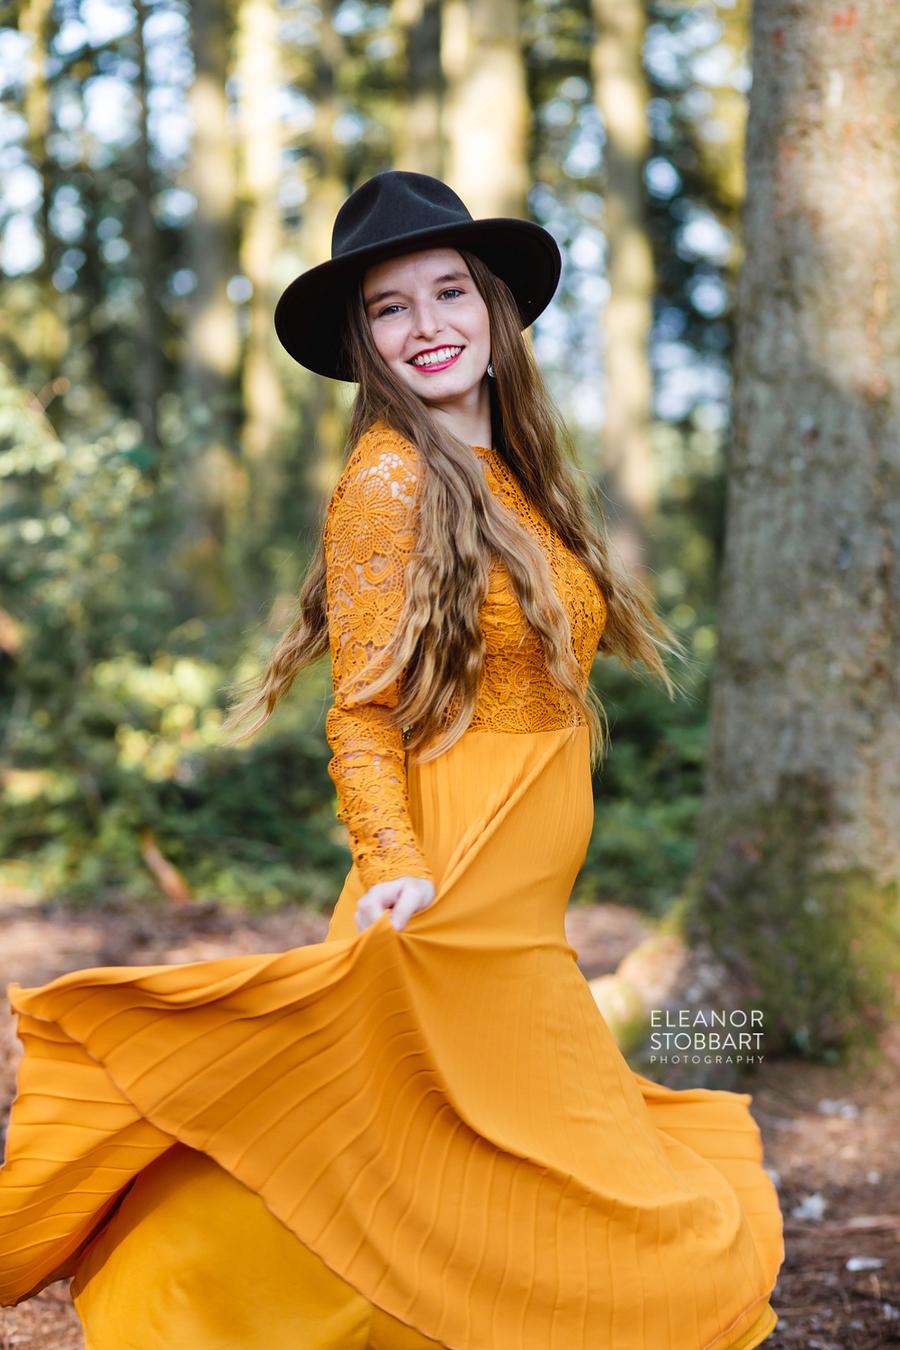 Smiles and Dress Swishing / Photography by Eleanor Stobbart, Model Jade Lyon / Uploaded 27th October 2020 @ 05:40 PM